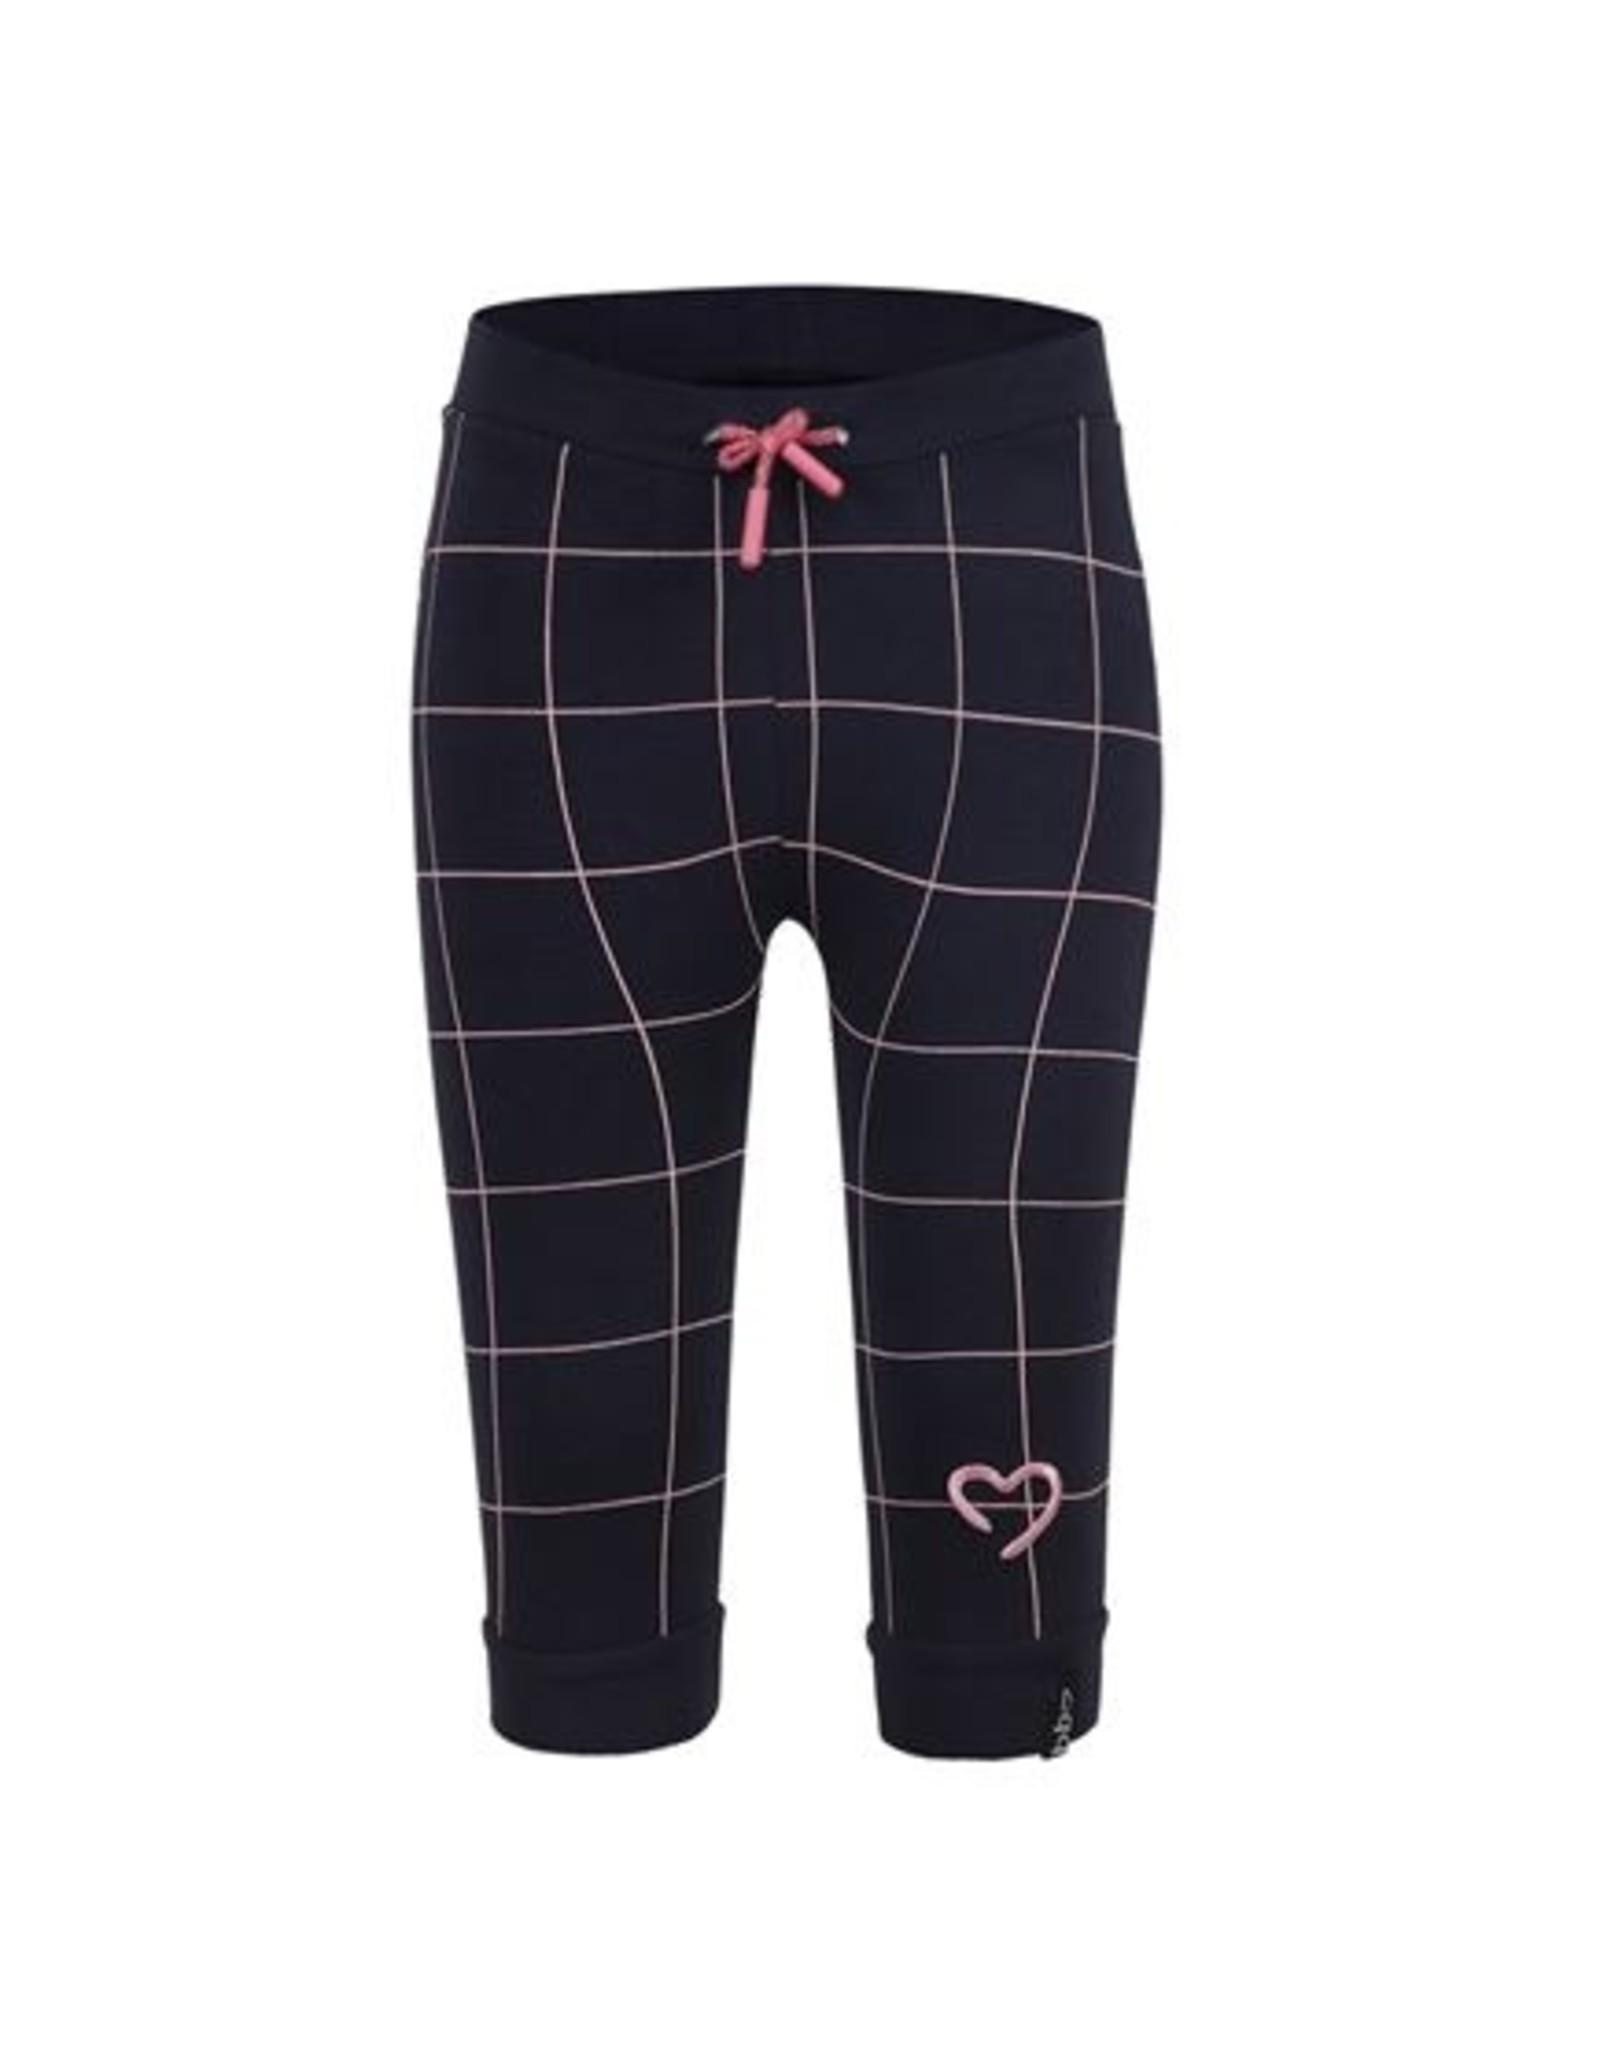 Beebielove Check pants, CHK